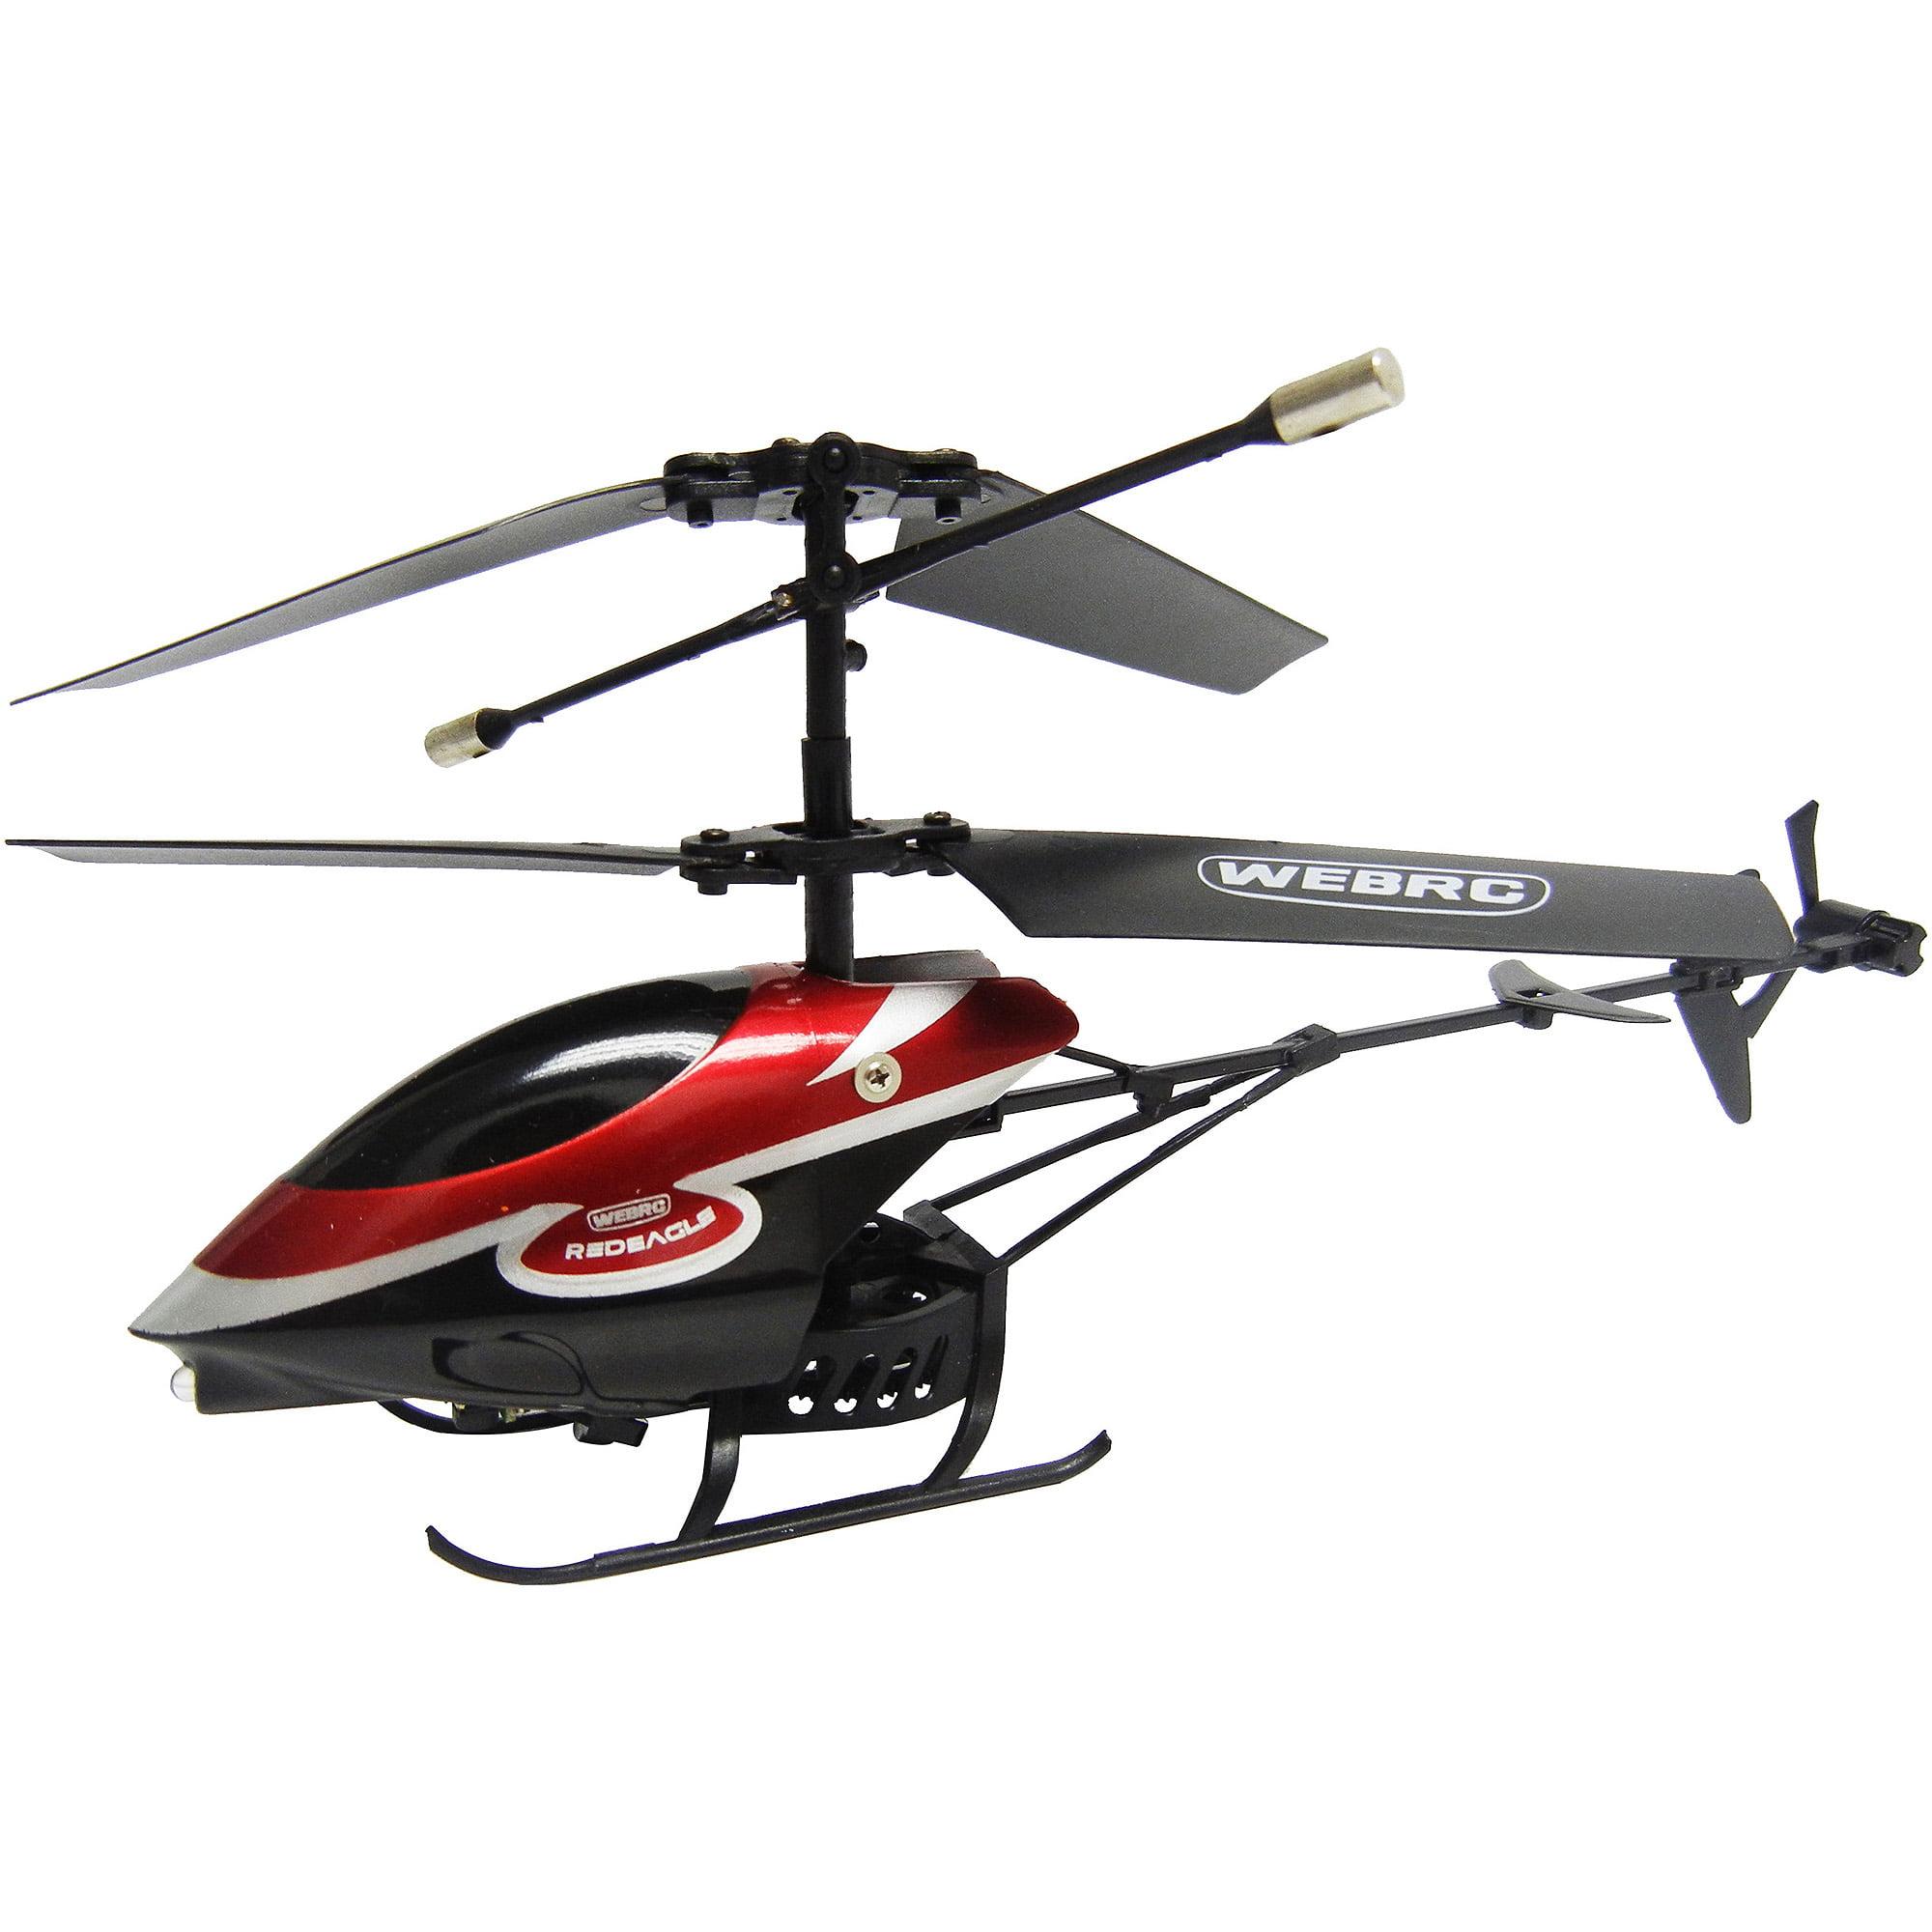 WebRC Red Eagle Helicopter Walmart